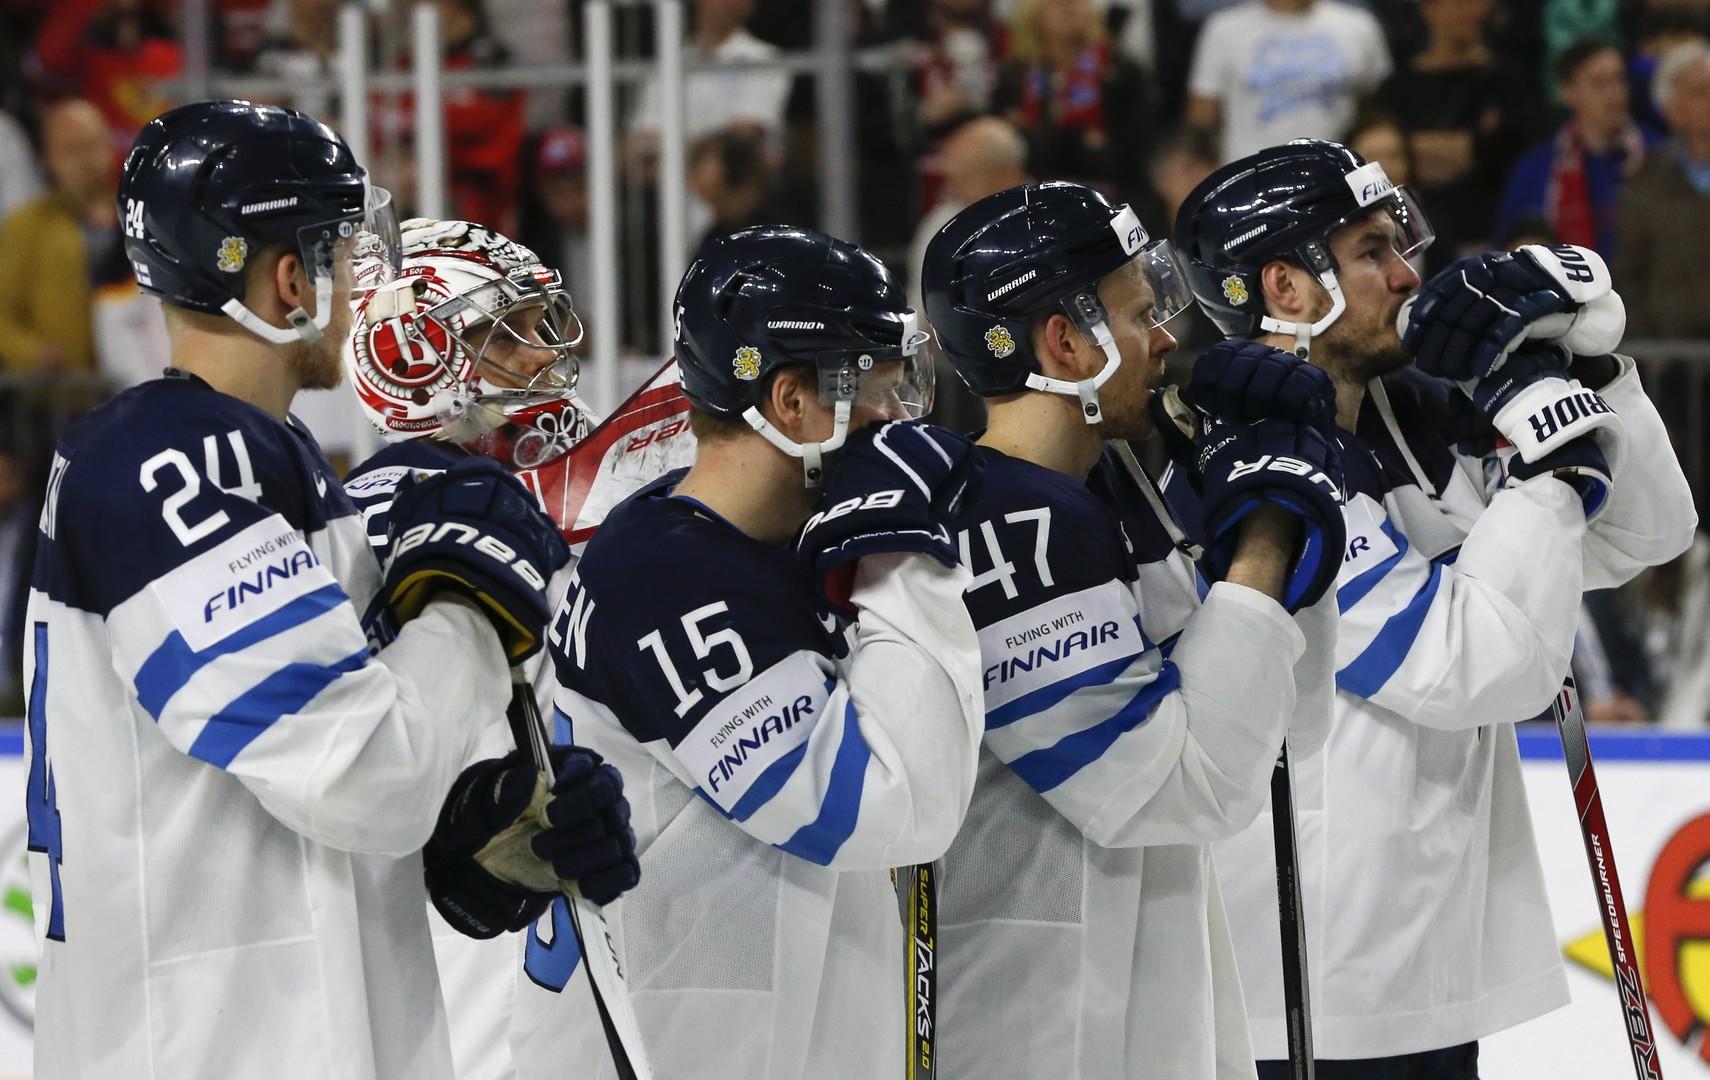 Картинки про хоккеистов финляндии